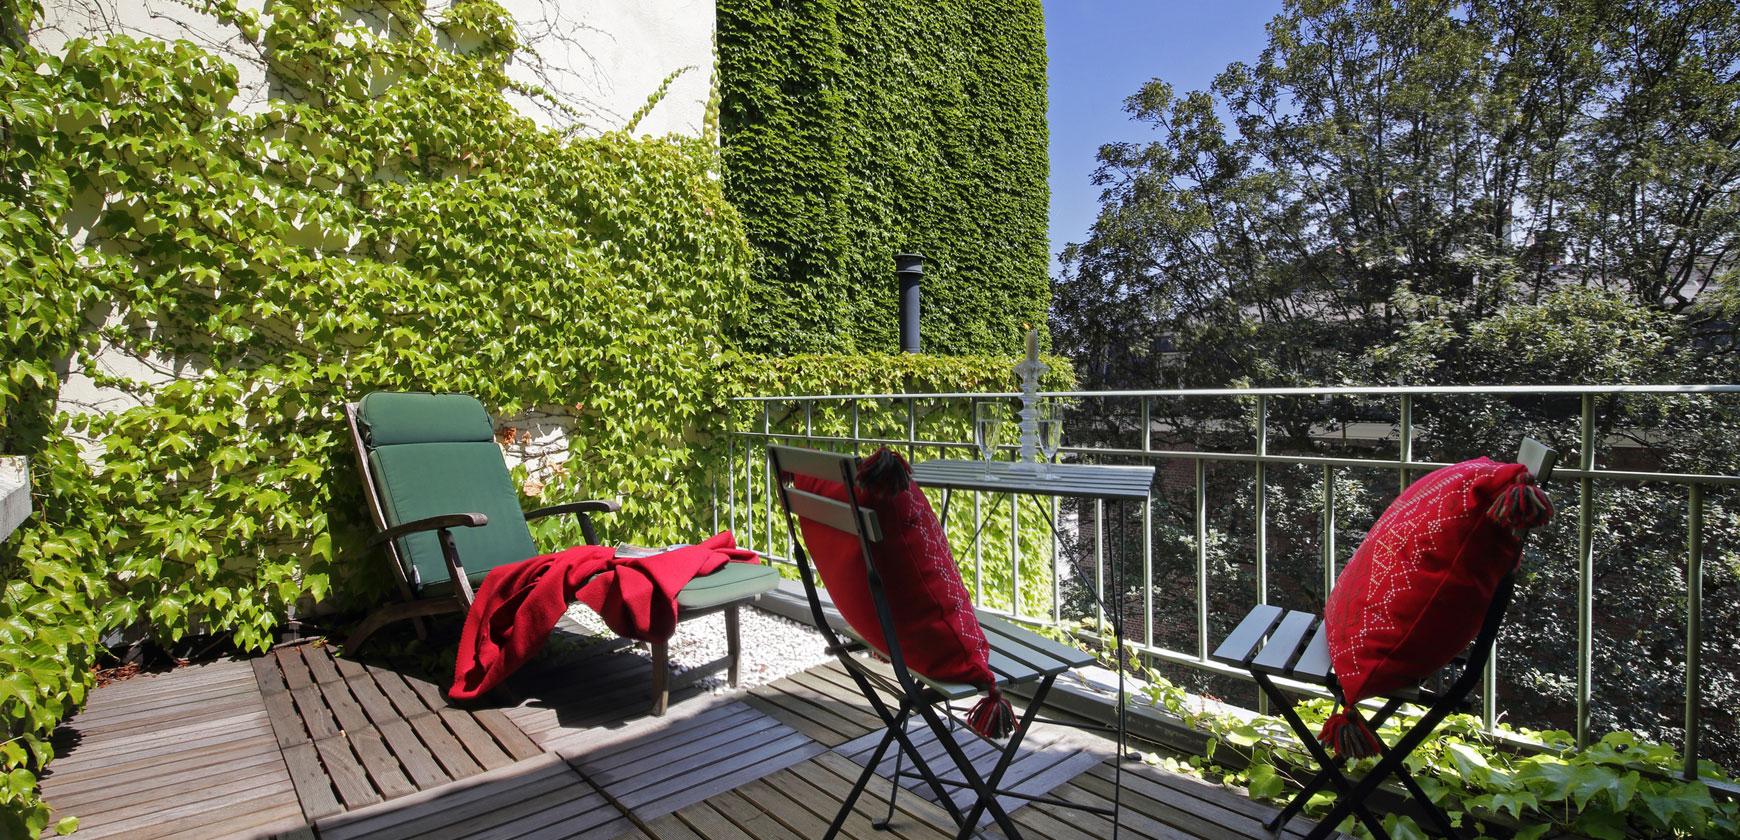 Anna_Turne-Barcelona_Propietats-terrassa